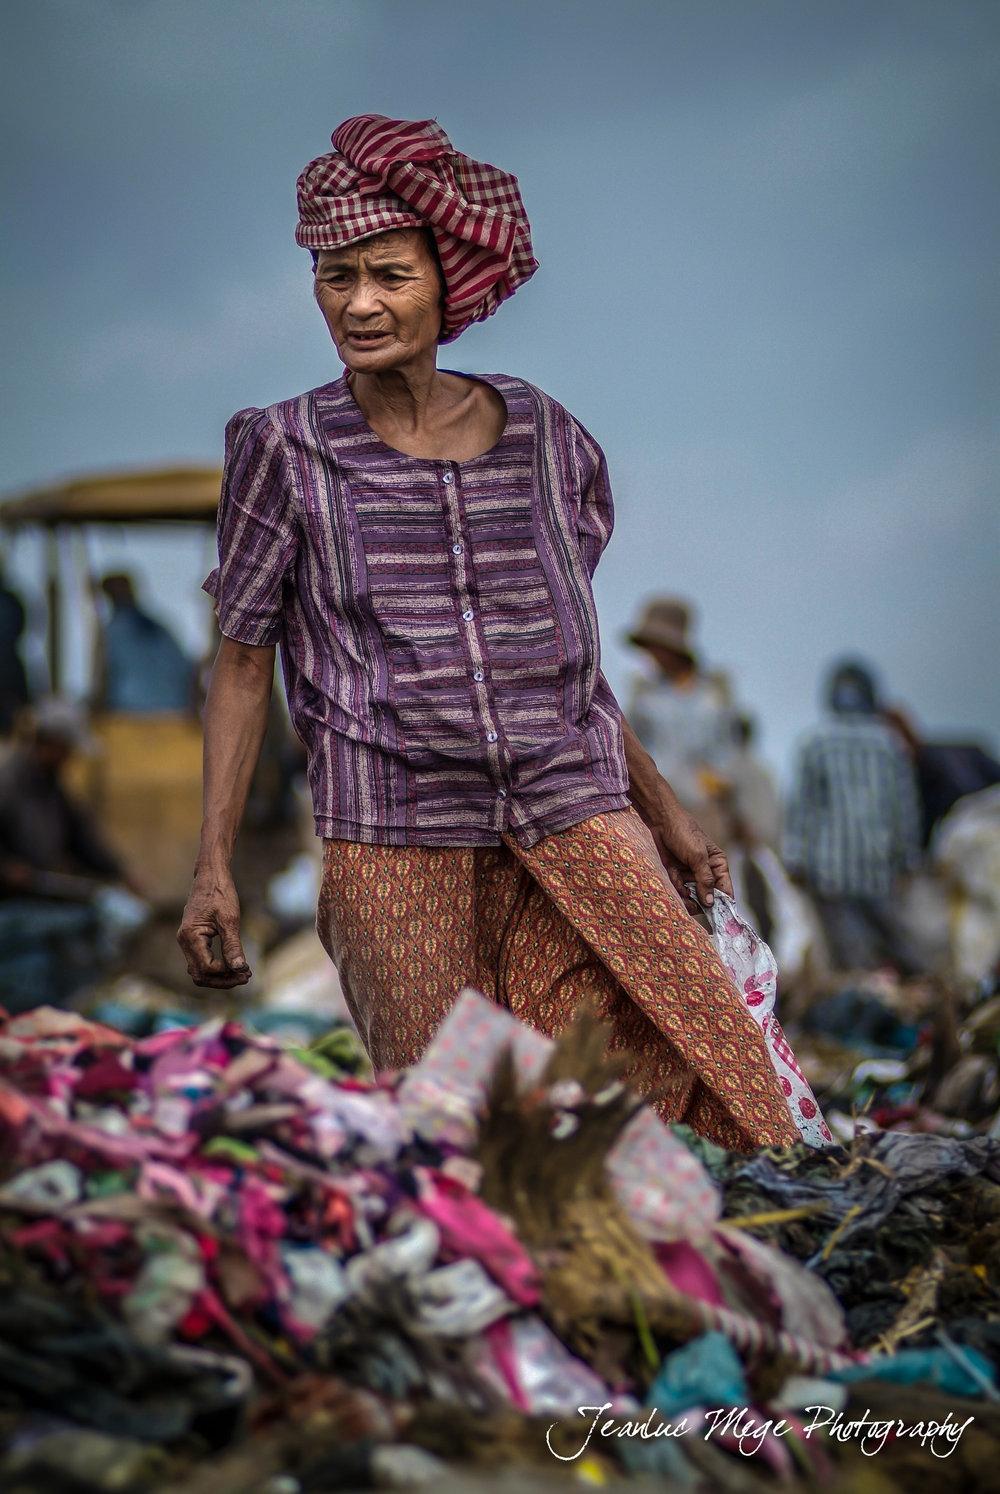 Jean Luc Mege Cambodia-8833.jpg